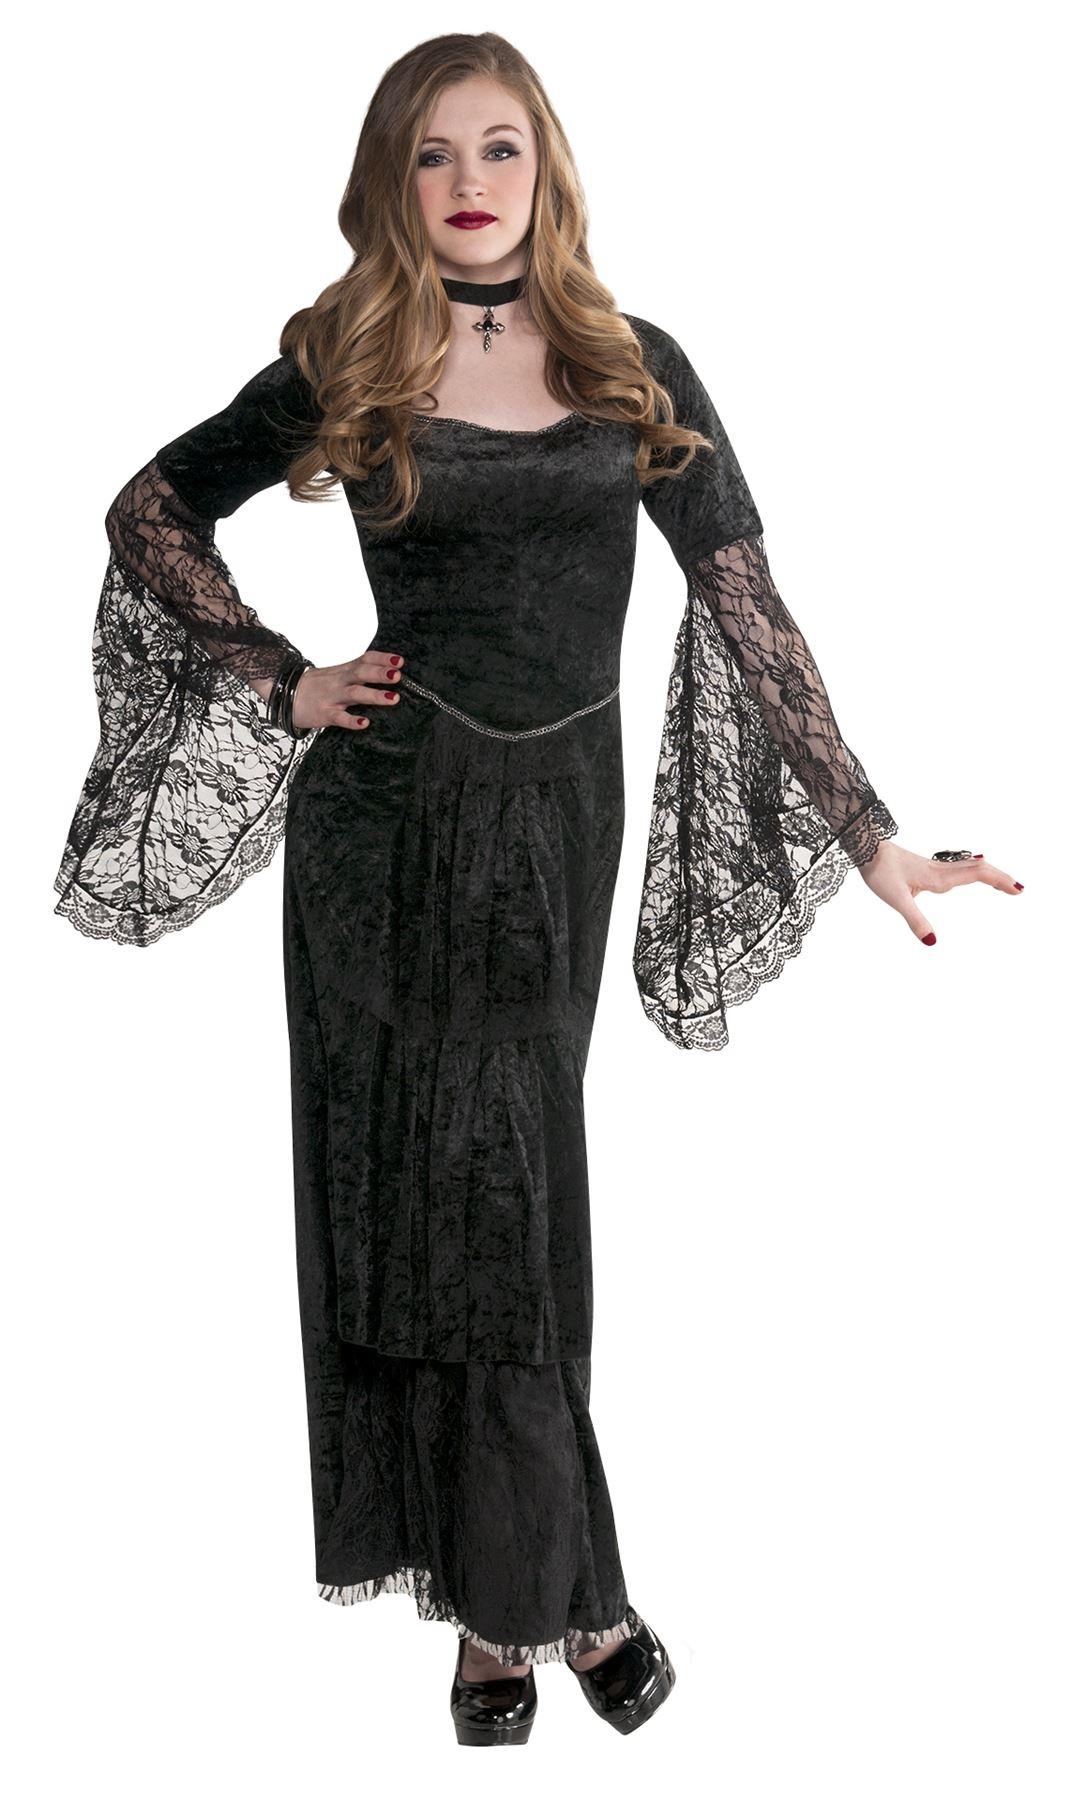 teen girls gothic temptress costume vampire witch halloween